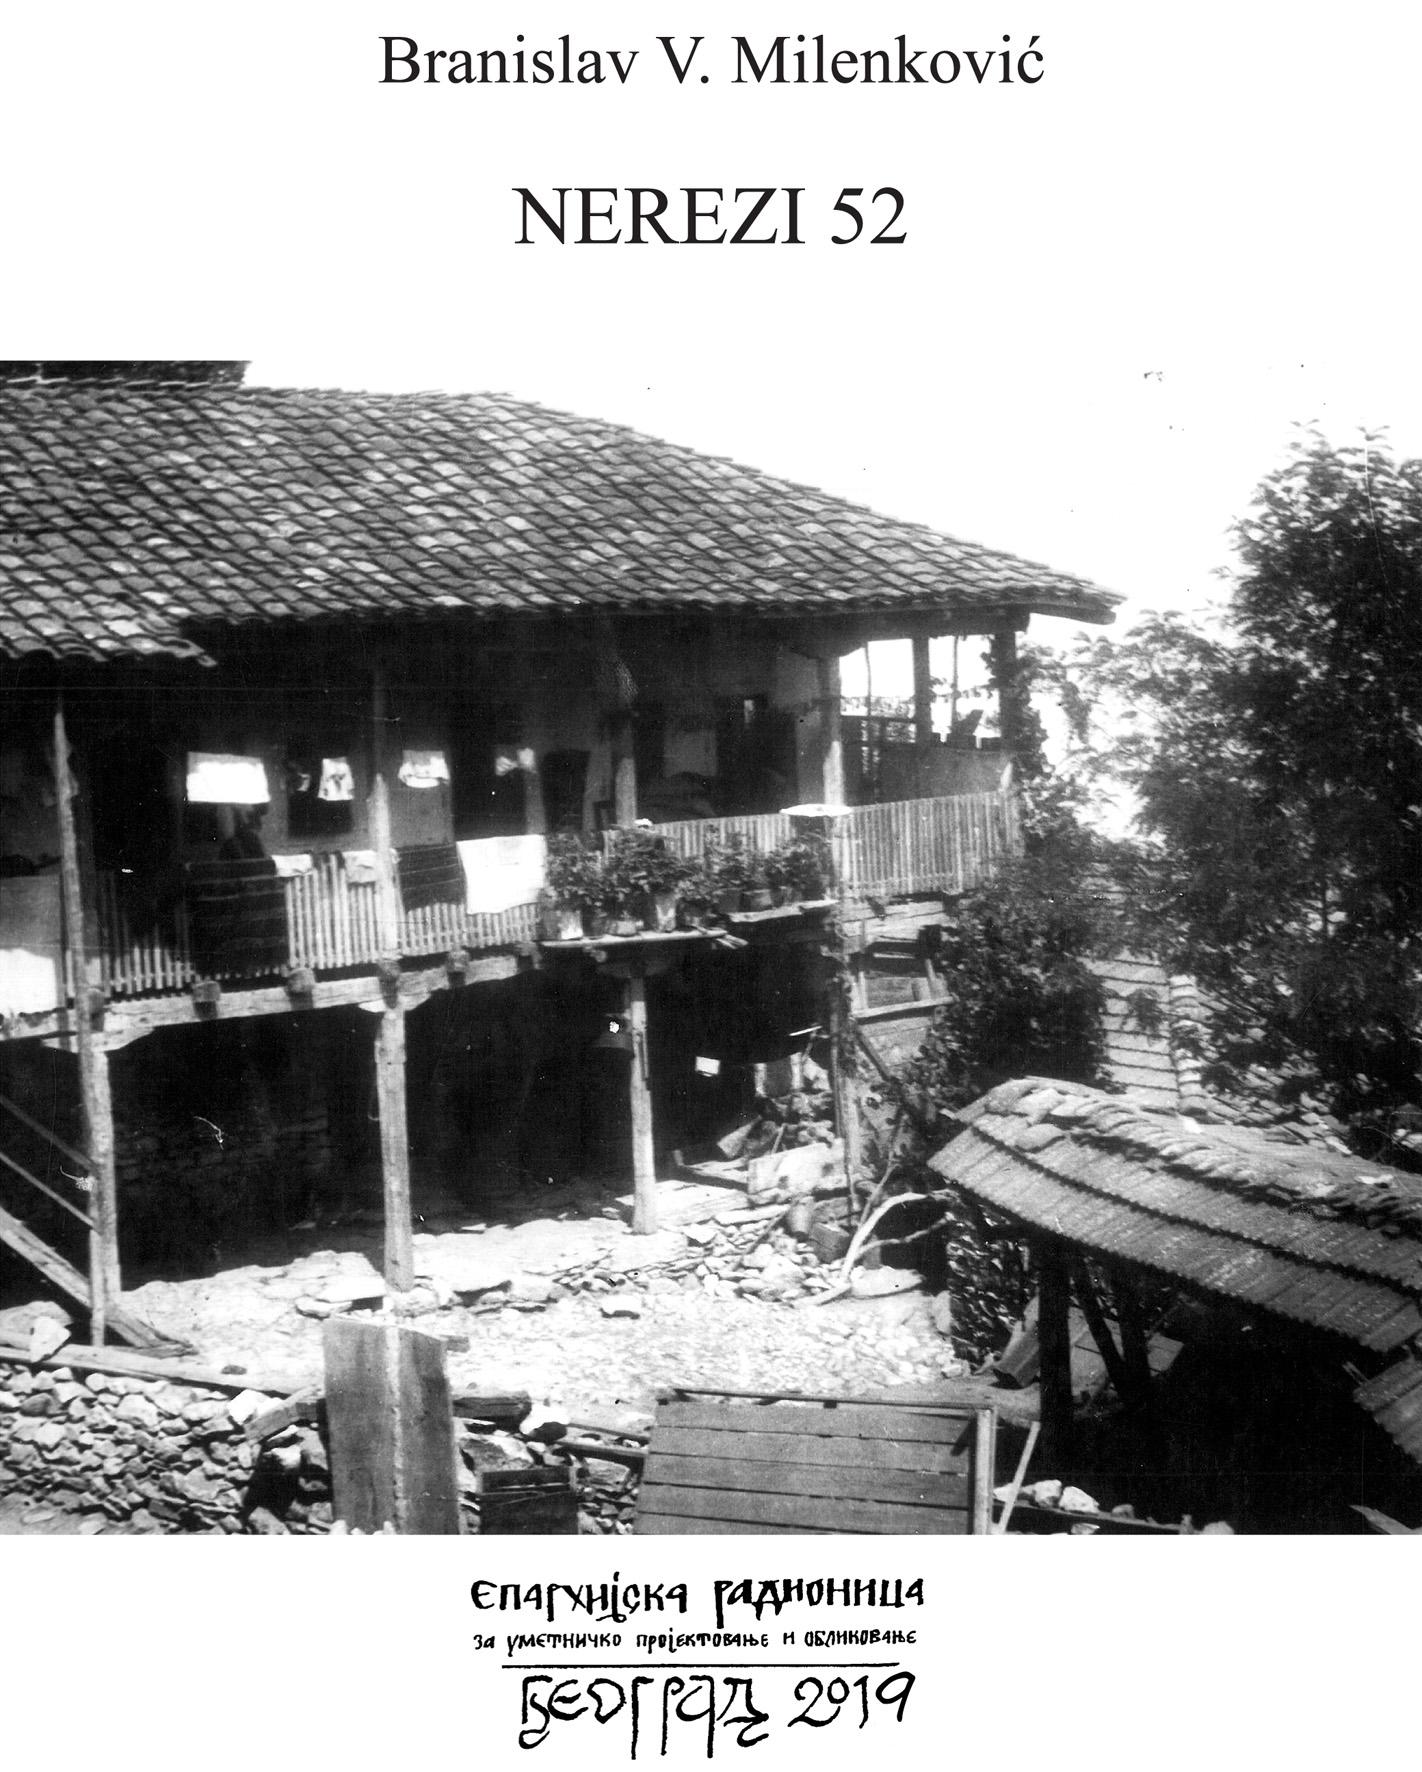 06 Nagrada publikacije Branislav MilenkovićNerezi naslovna